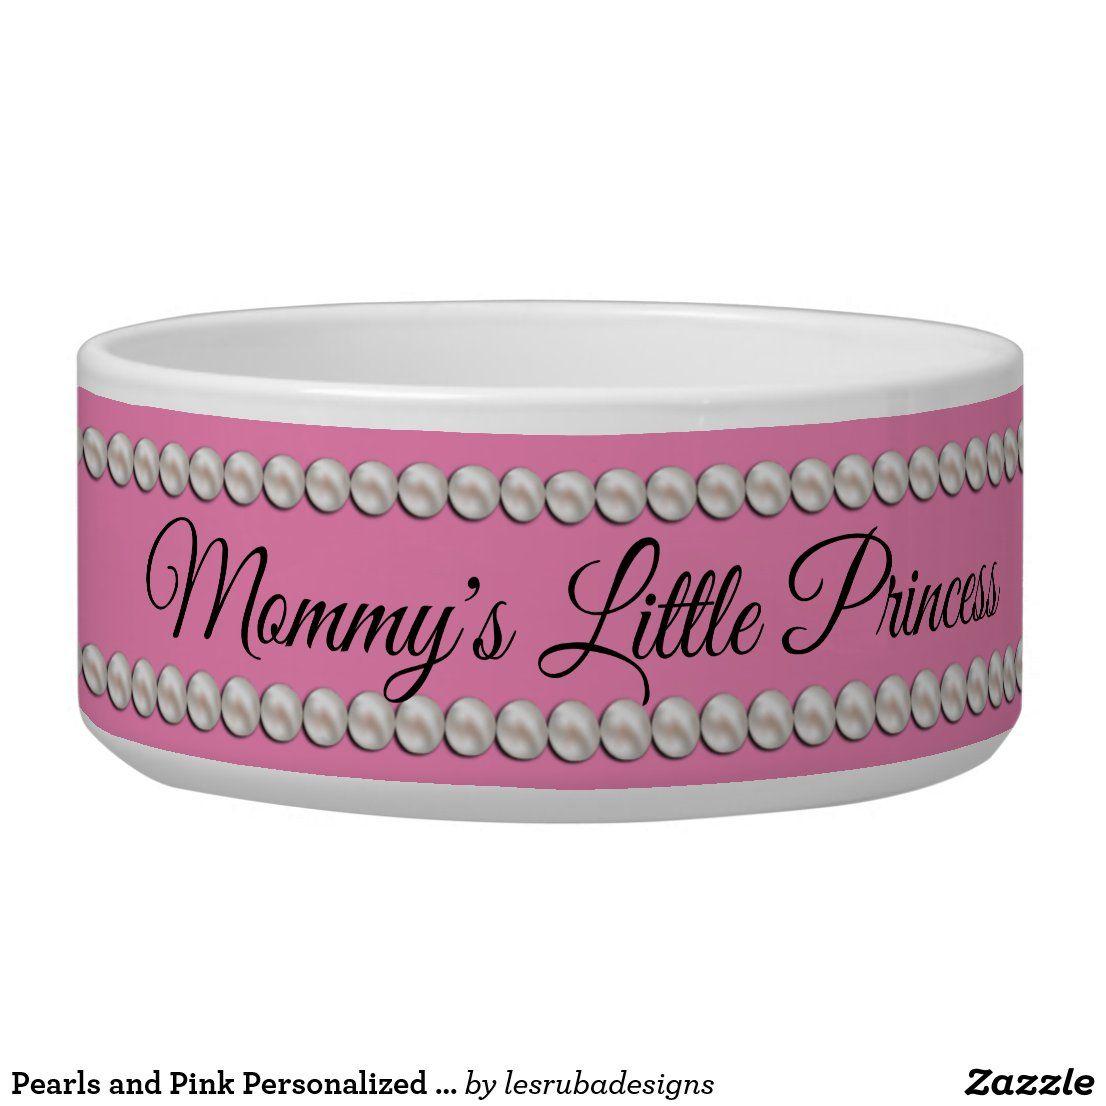 Pearls And Pink Personalized Princess Dog Bowl Zazzle Com In 2021 Dog Bowls Ceramic Dog Bowl Princess Dog